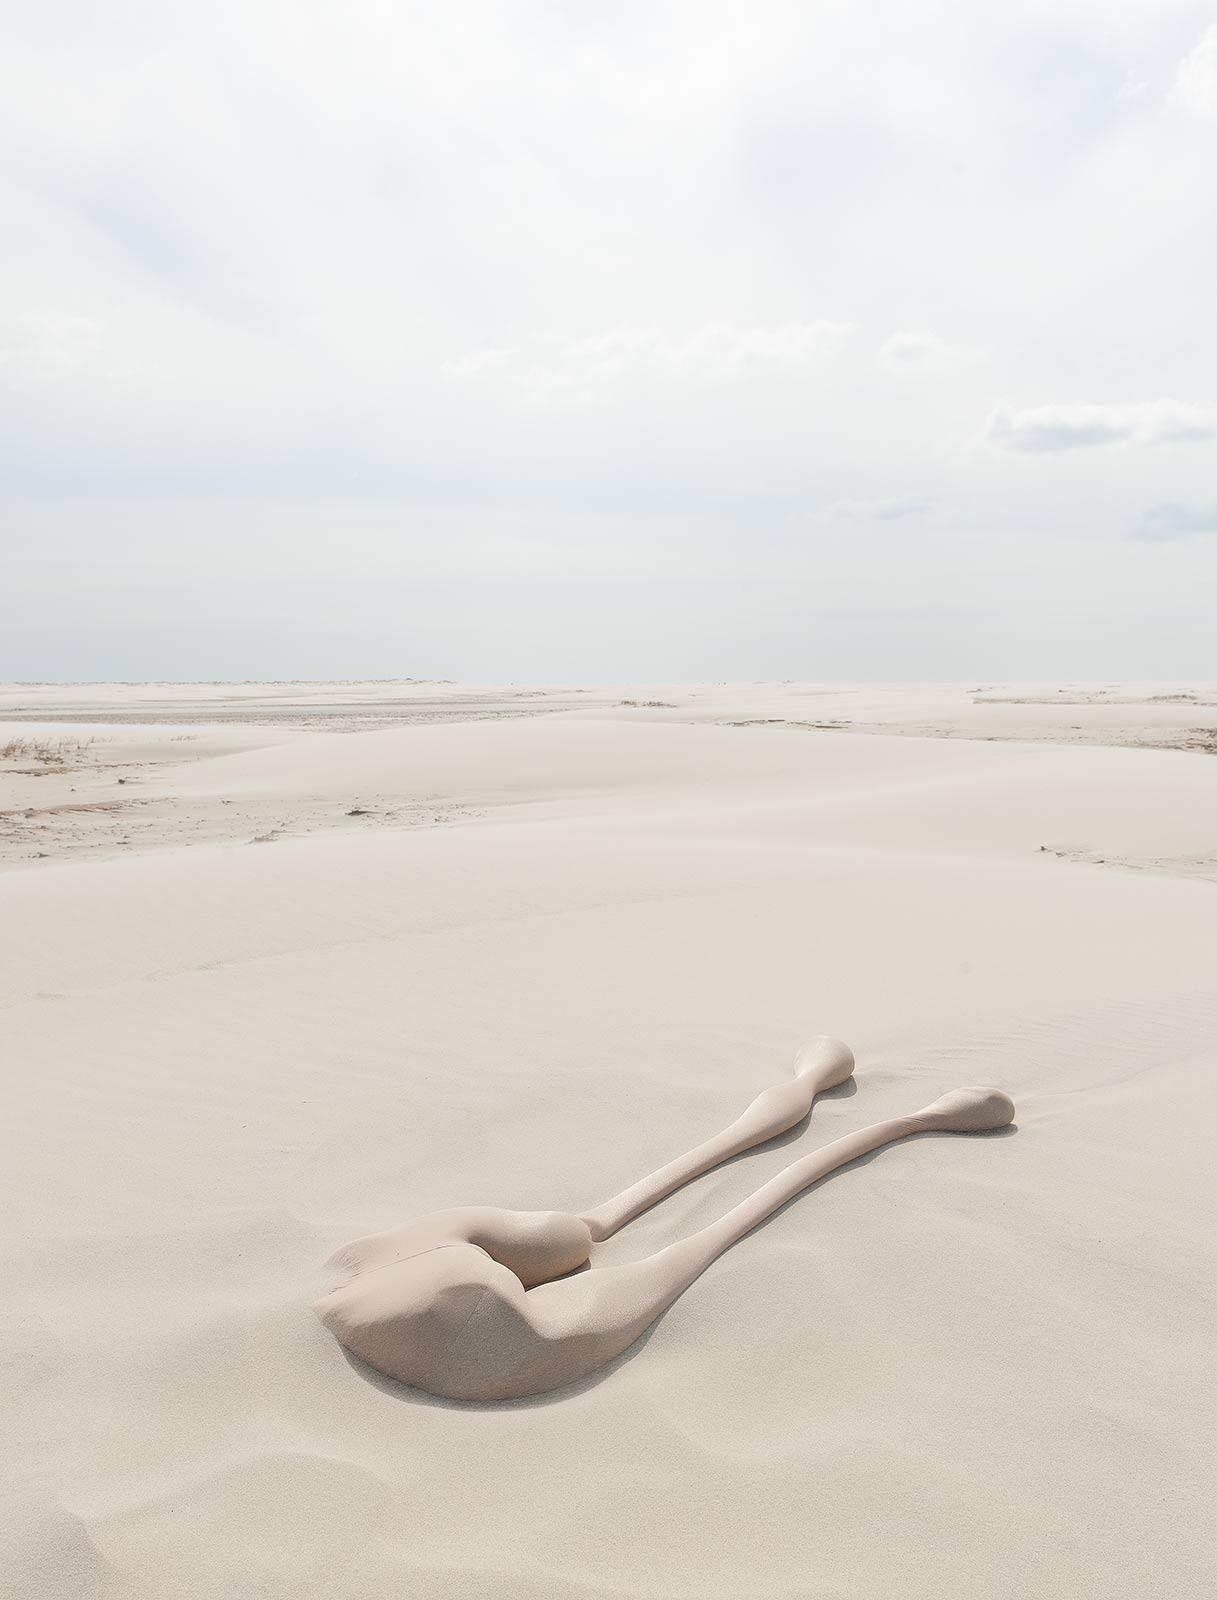 fabian_matz_2017_shaped_bodies_sand_polyamide_tights_16